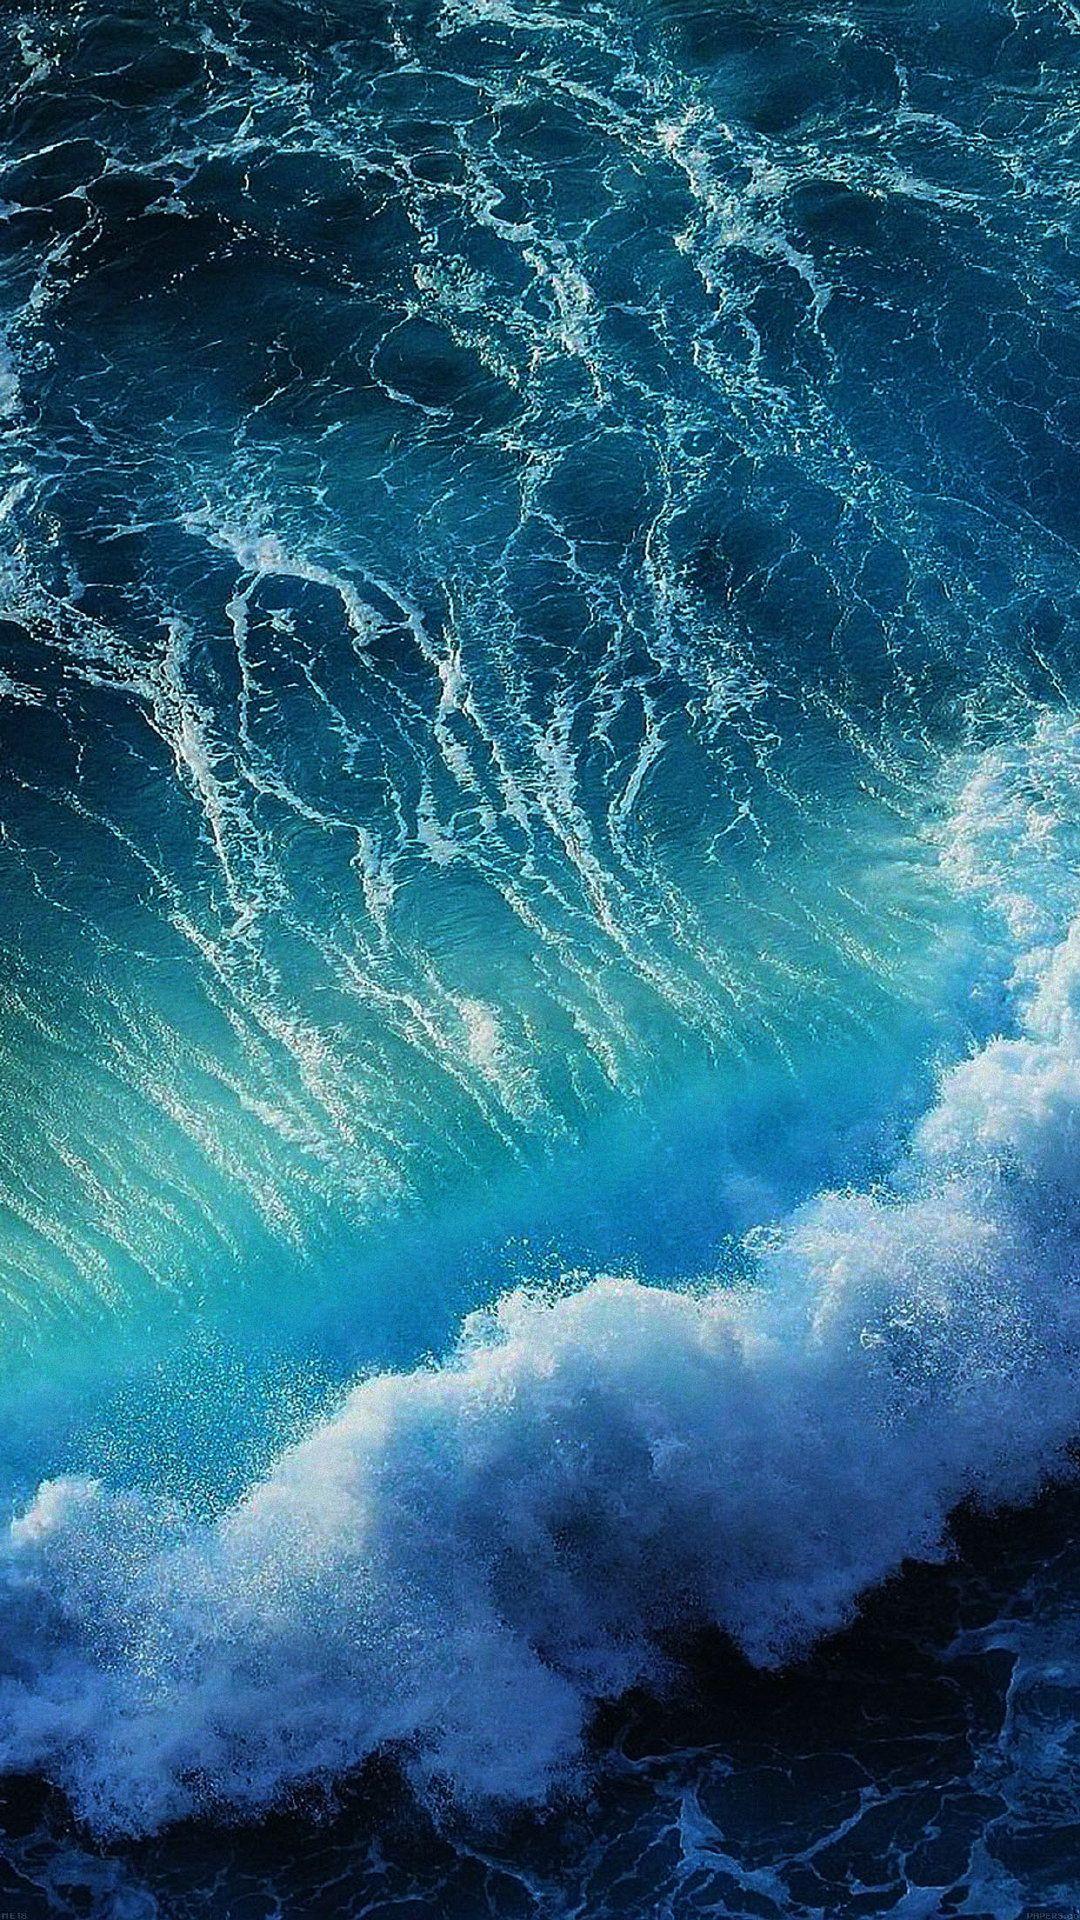 Phone Wallpaper Landscape Ocean Sea Sea Wallpaper Background Wallpaper Background Iphone Phone Mobile Ocean Waves Ocean Wallpaper Ios 11 Wallpaper